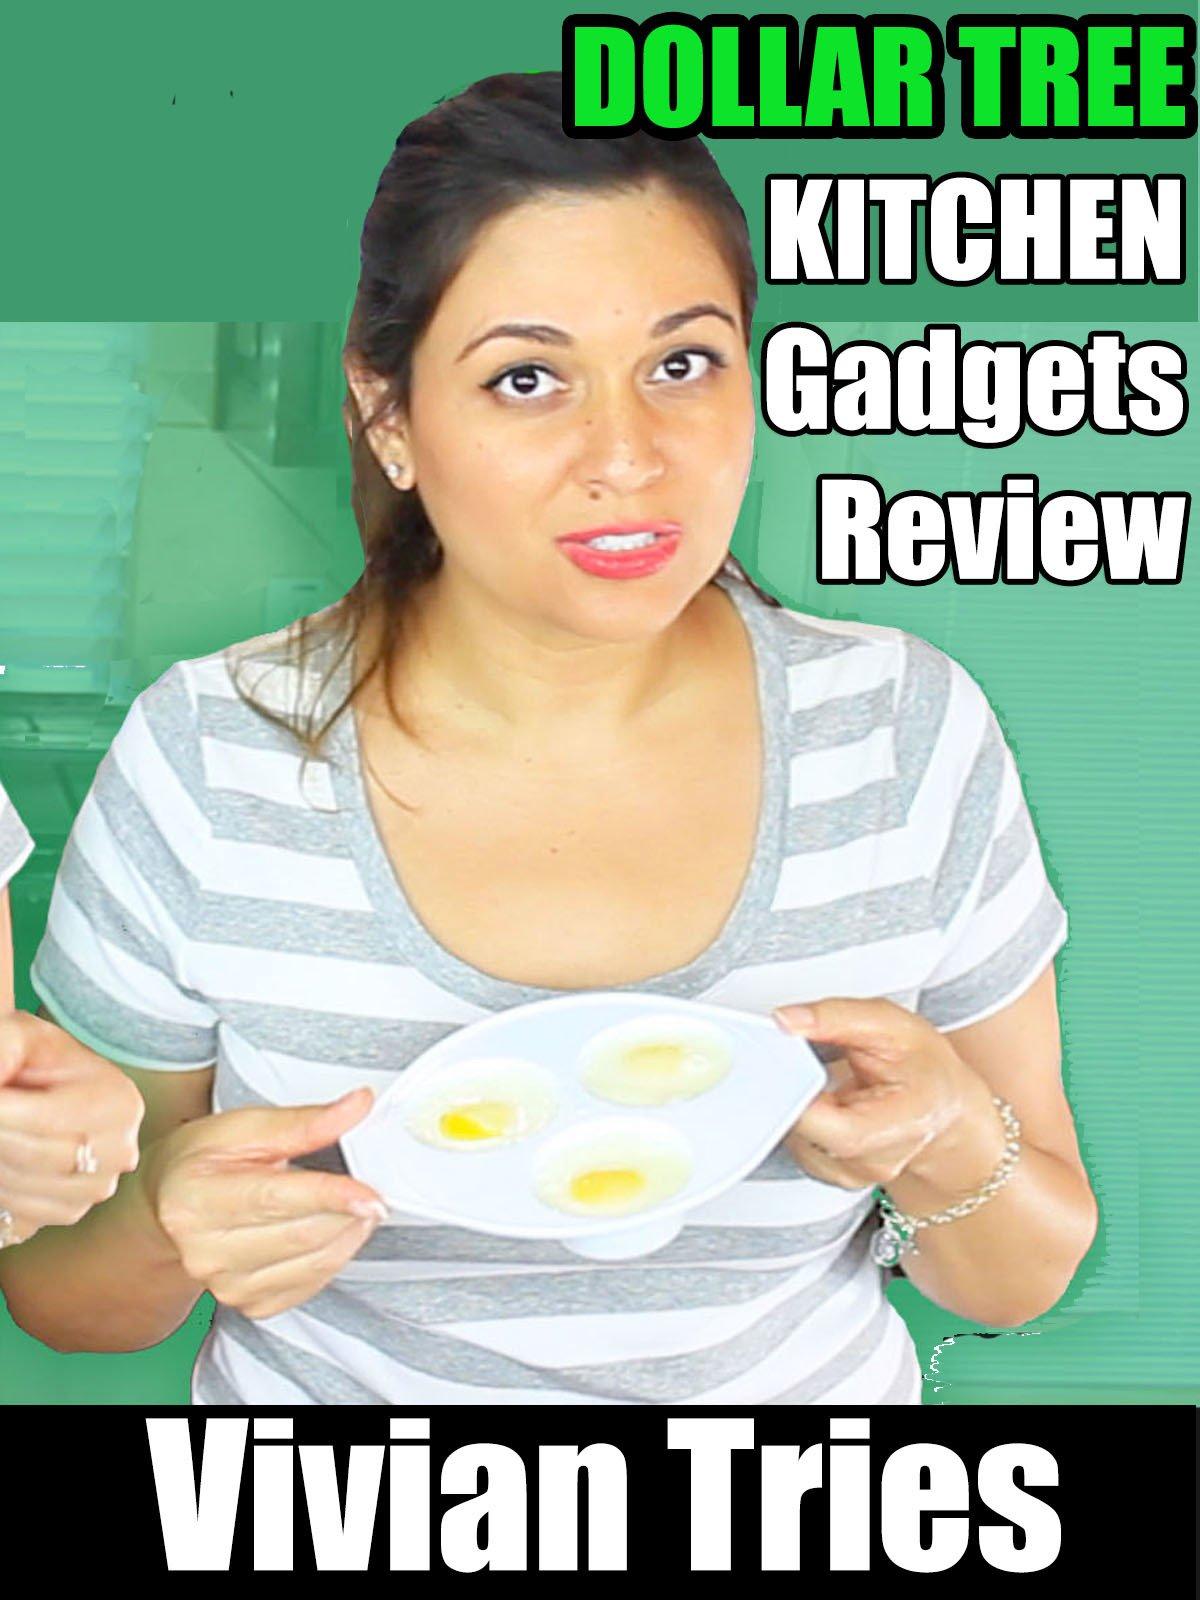 Review: Vivian Tries Dollar Tree Kitchen Gadgets Review